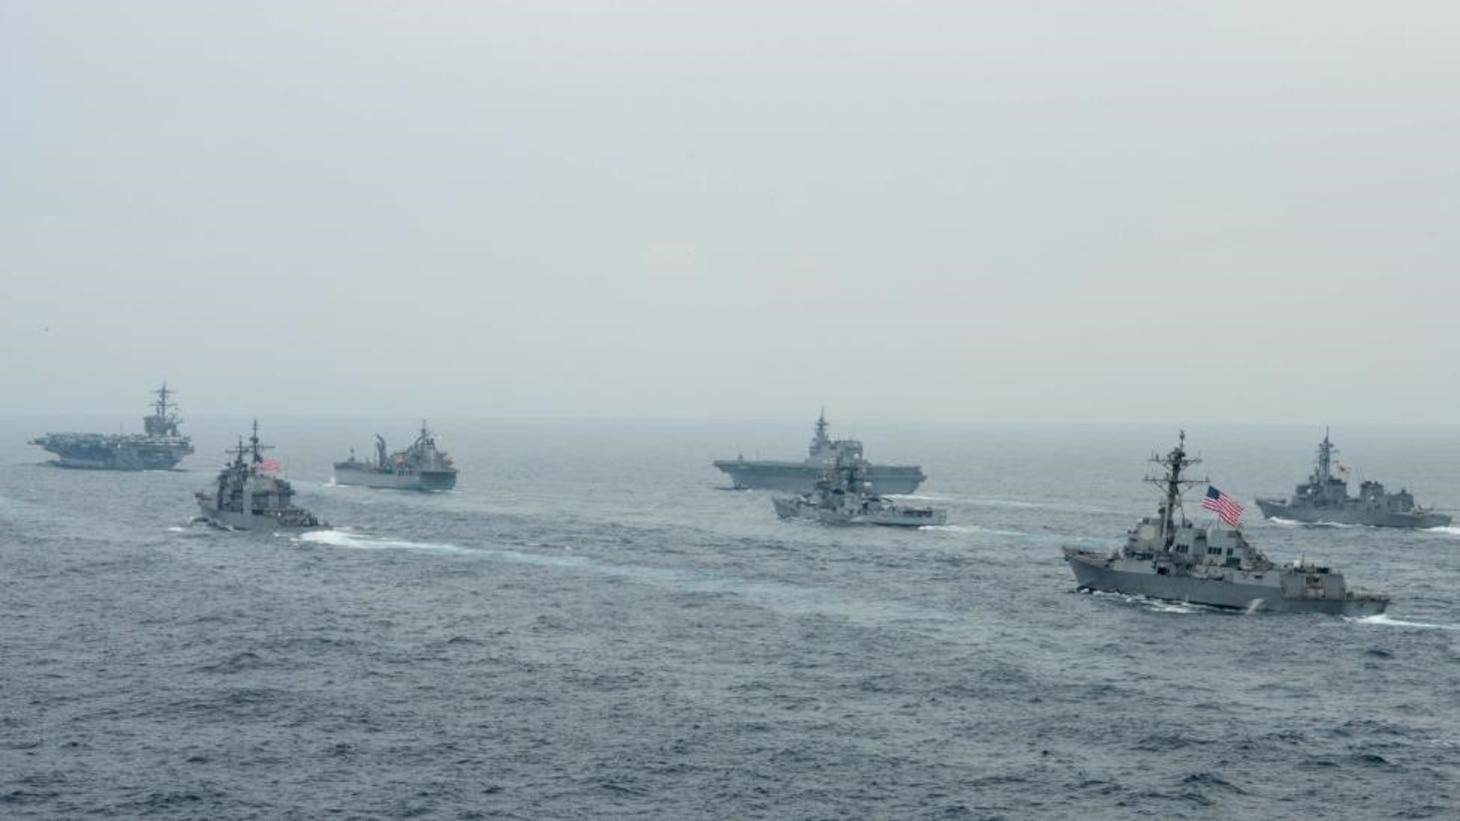 USS Carl Vinson (CVN 70), USS Lake Champlain (CG 57), HMAS Sirius (O 266), JS Izumo-class helicopter destroyer JS Kaga (DDH 184), INS Ranvijay (D55), USS Stockdale (DDG 106) and JS Murasame (DD 101) transit the Bay of Bengal during MALABAR 2021.